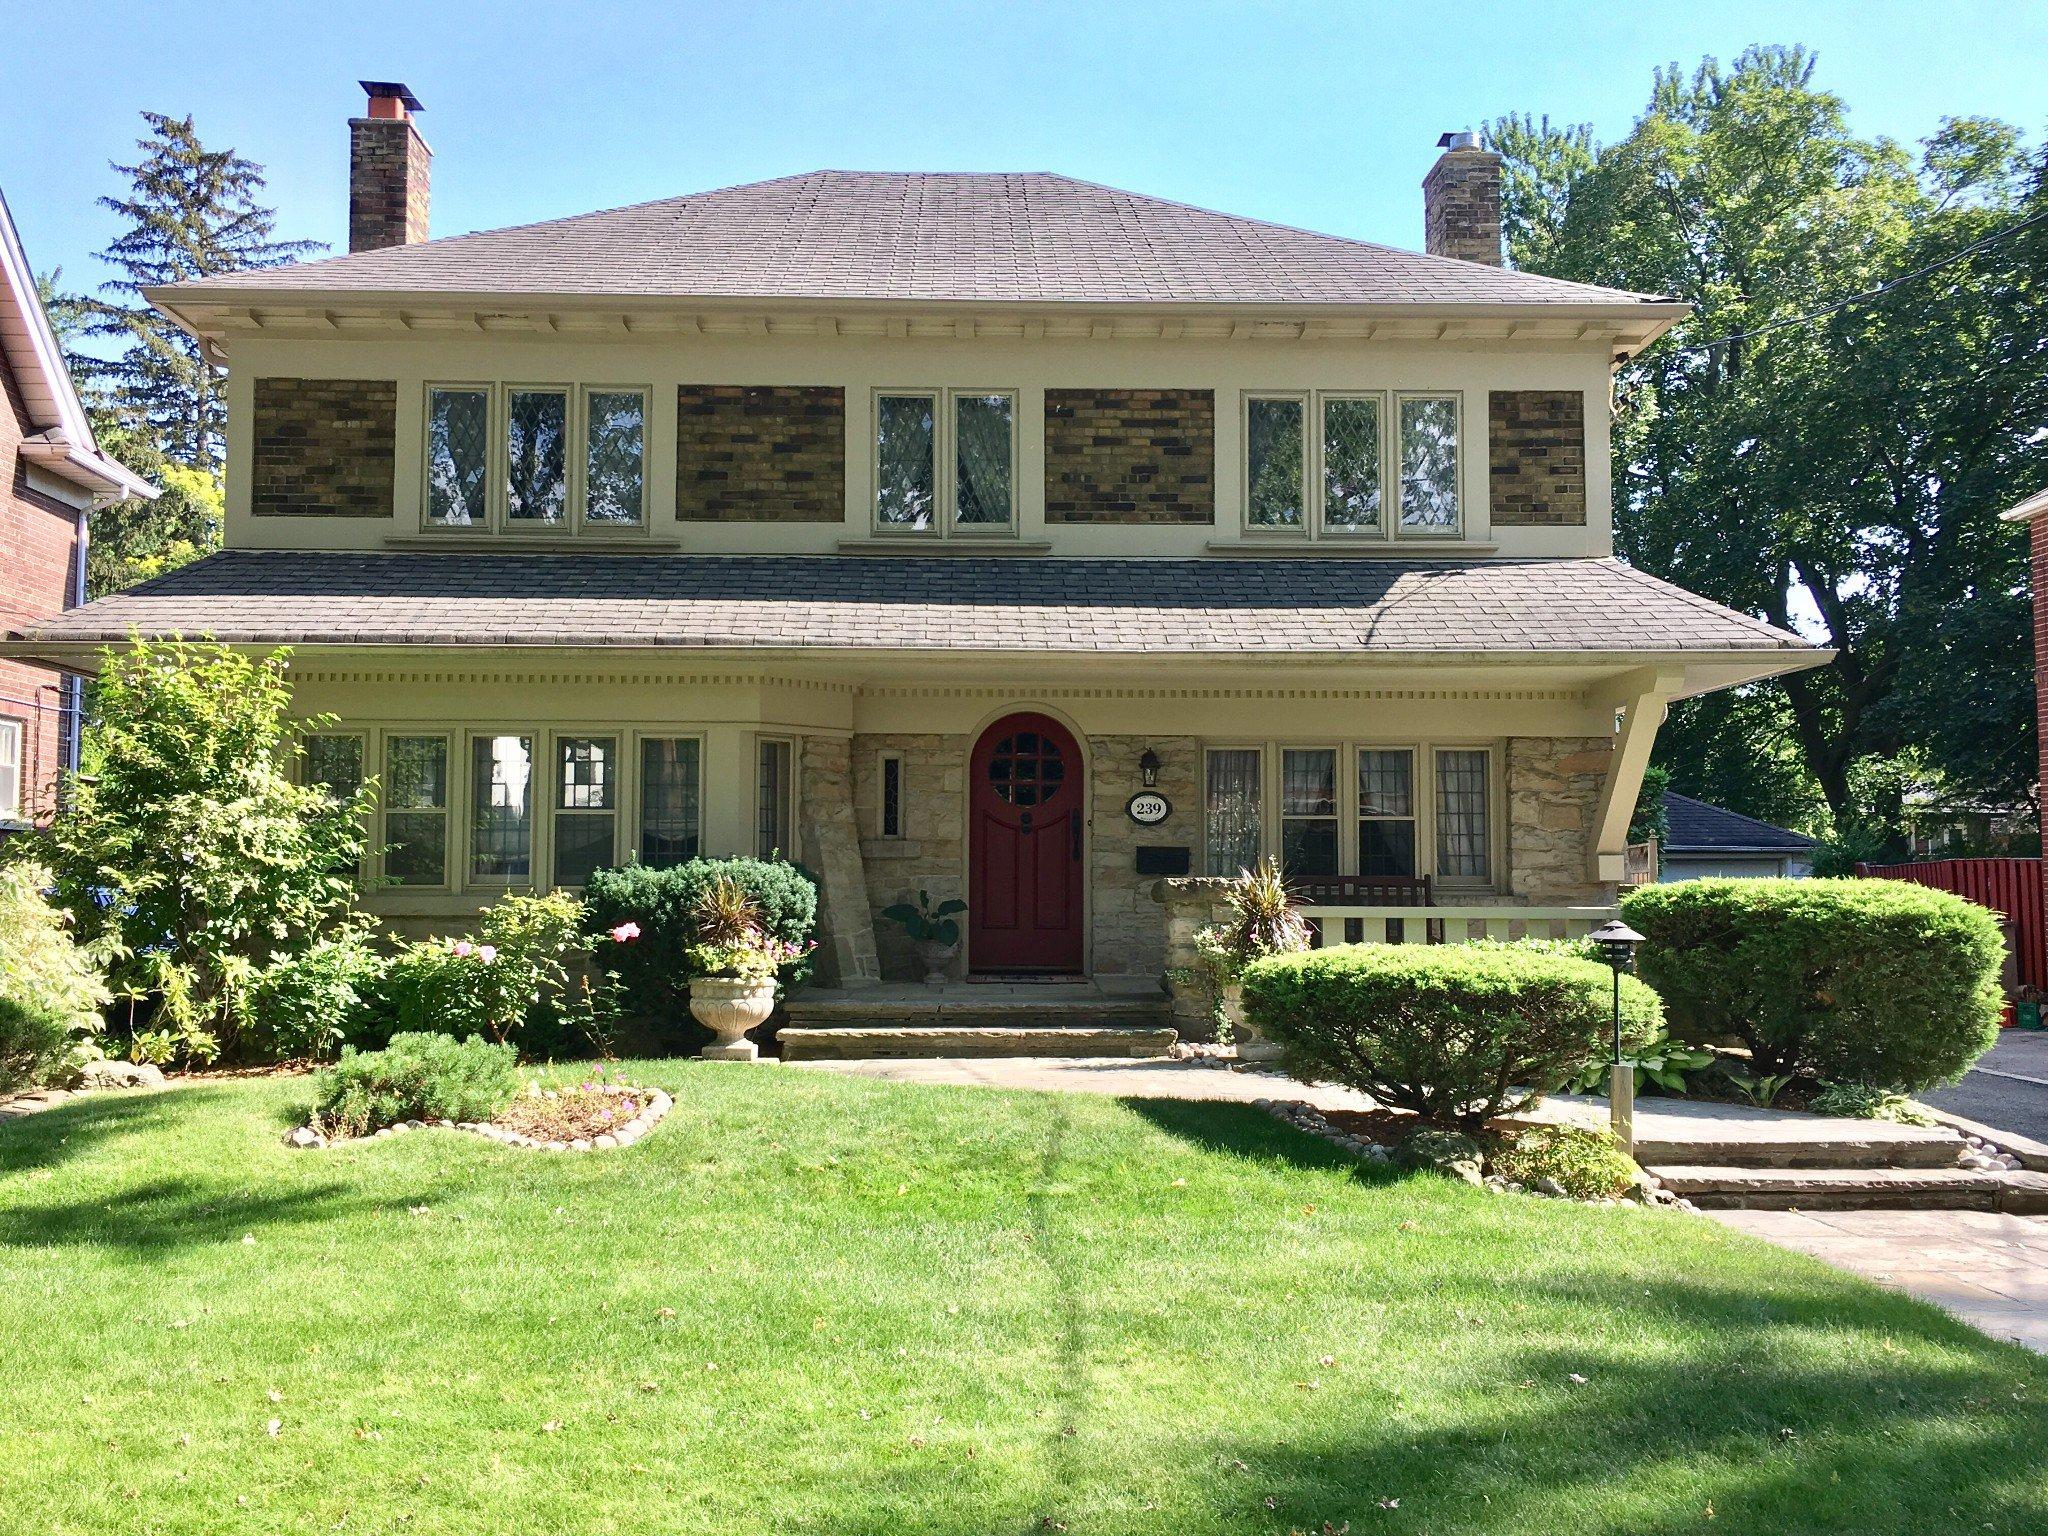 Main Photo: 239 Cortleigh Blvd. in Toronto: Lytton Freehold for sale (Toronto C04)